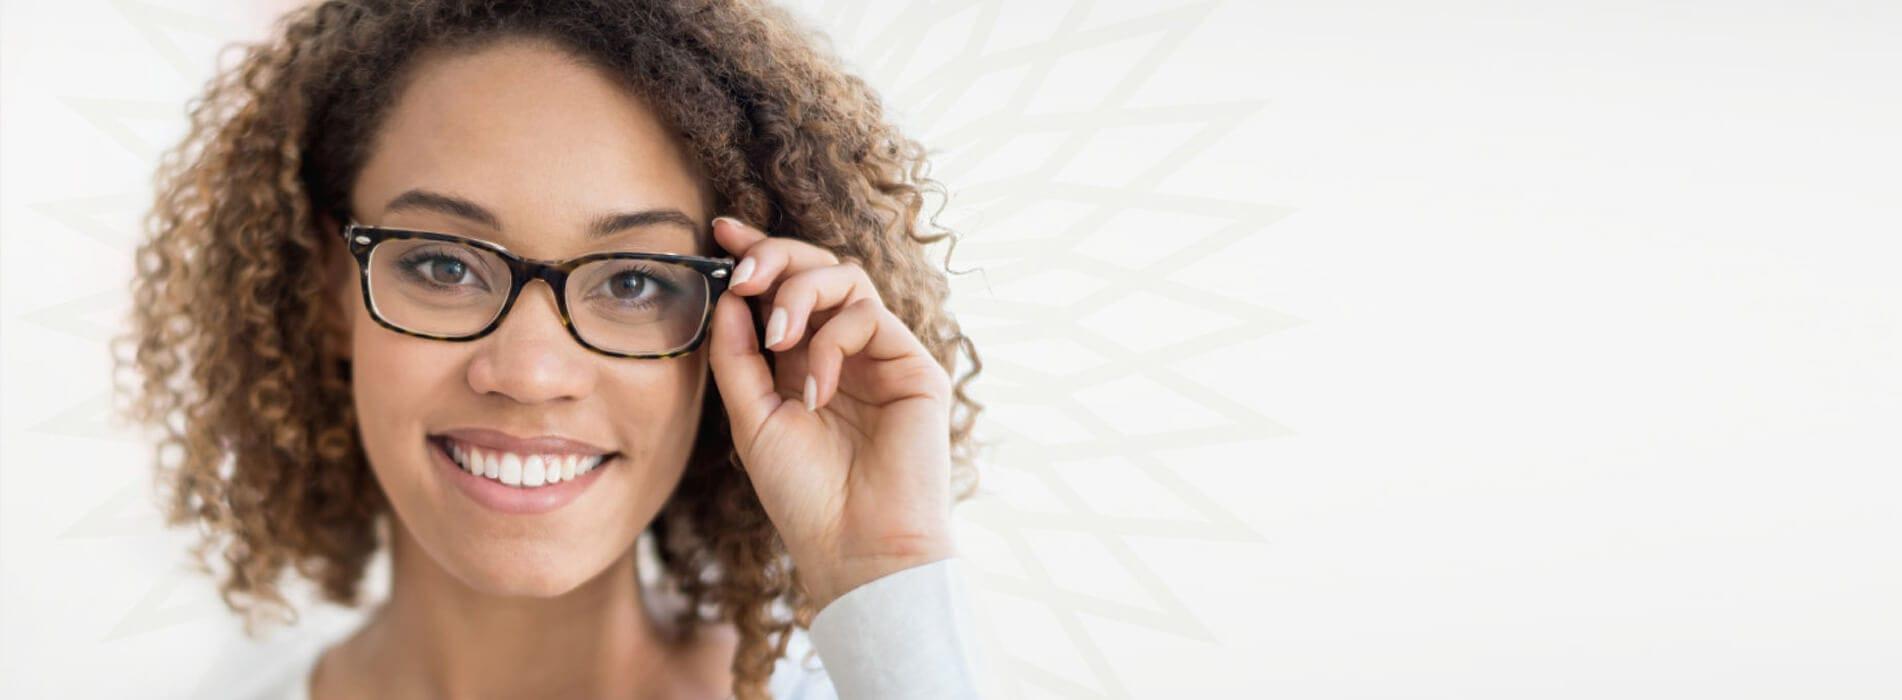 Lady Wearing Glasses